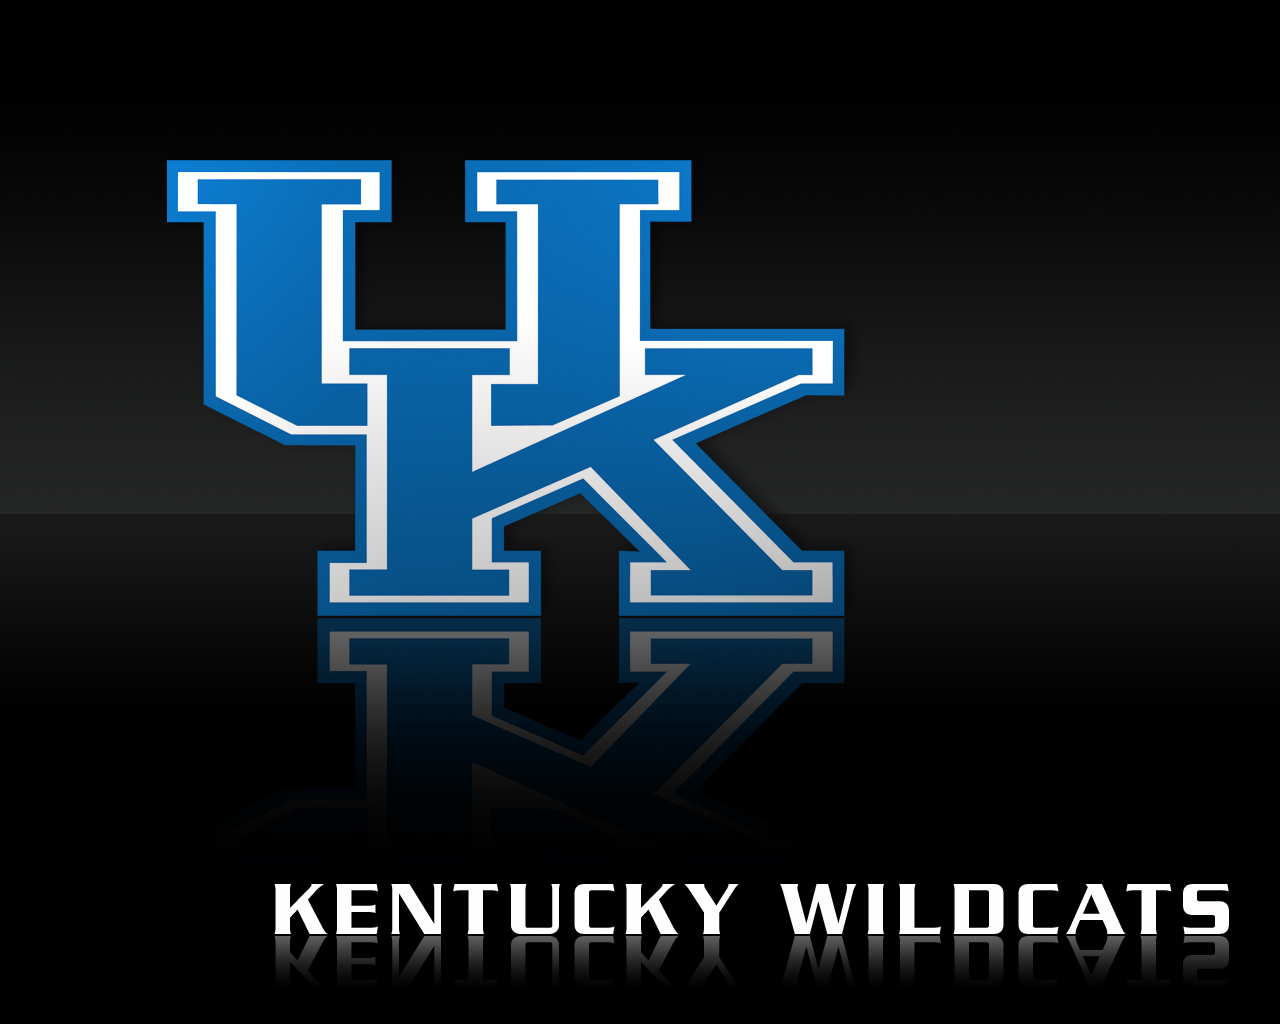 FunMozar Kentucky Wildcats Basketball Wallpapers 1280x1024